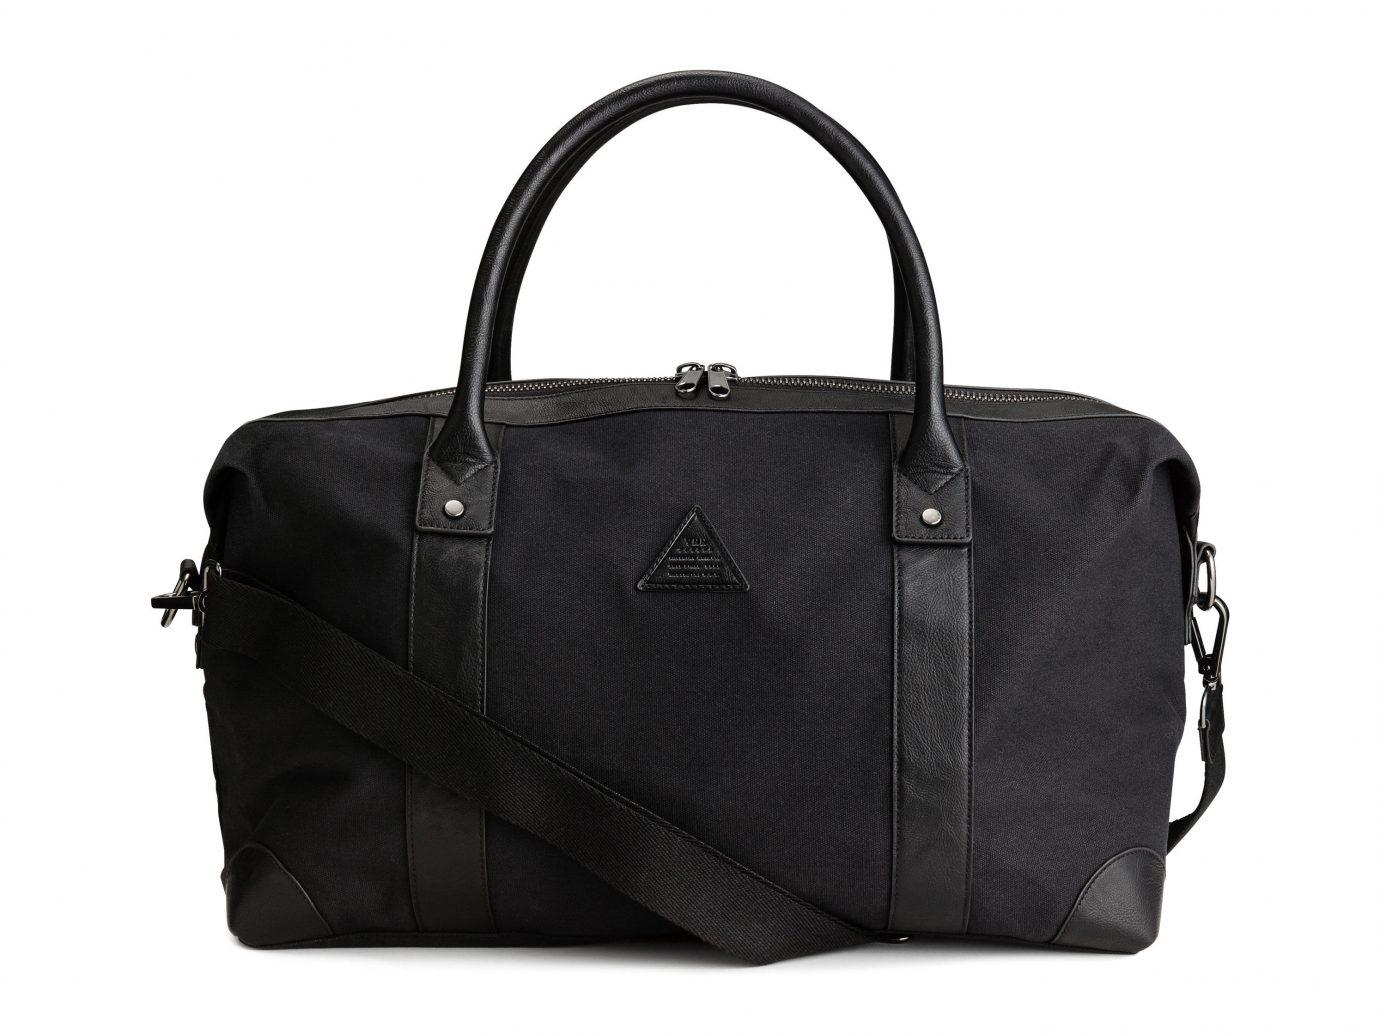 Style + Design luggage suitcase accessory bag handbag piece case shoulder bag briefcase black business bag leather baggage hand luggage